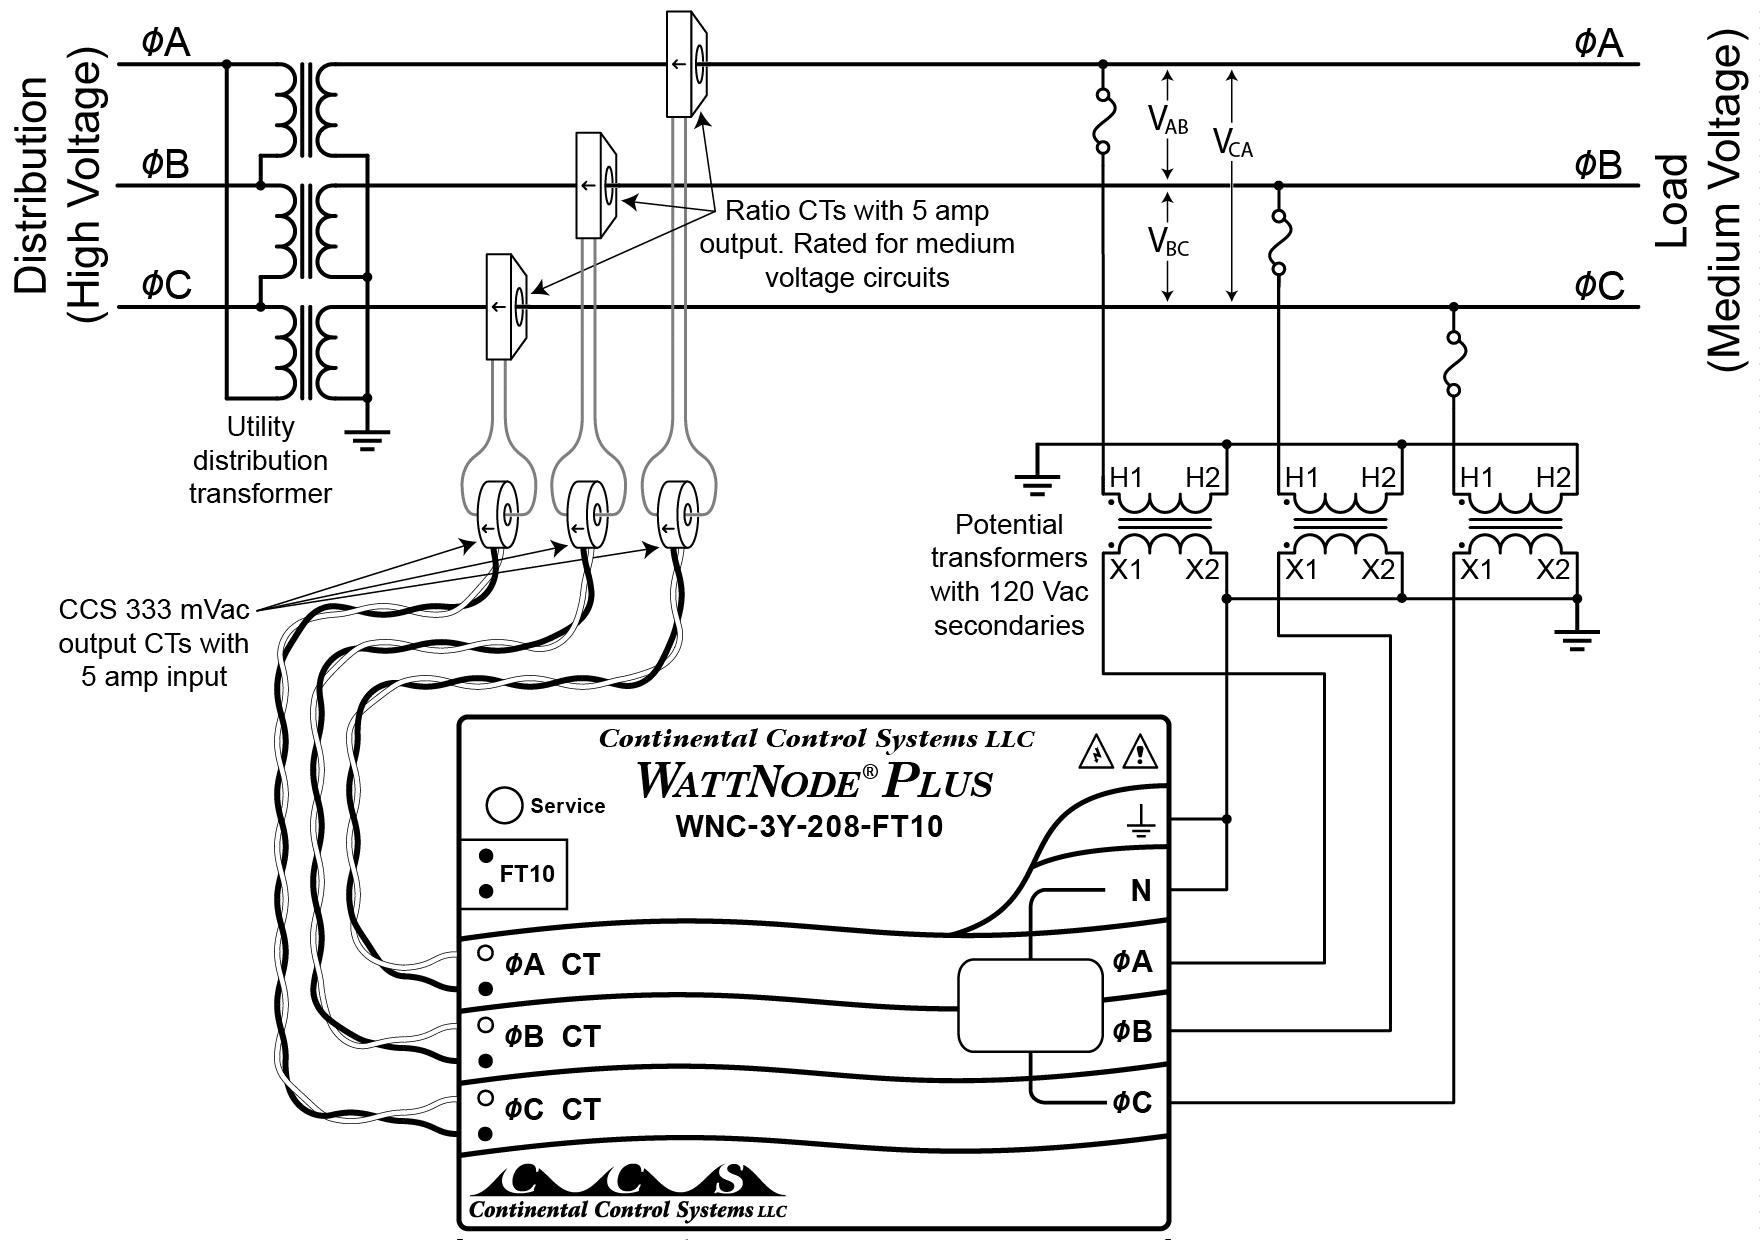 sun tach wiring diagram stewart block diagram of diagram to wire a, Wiring diagram